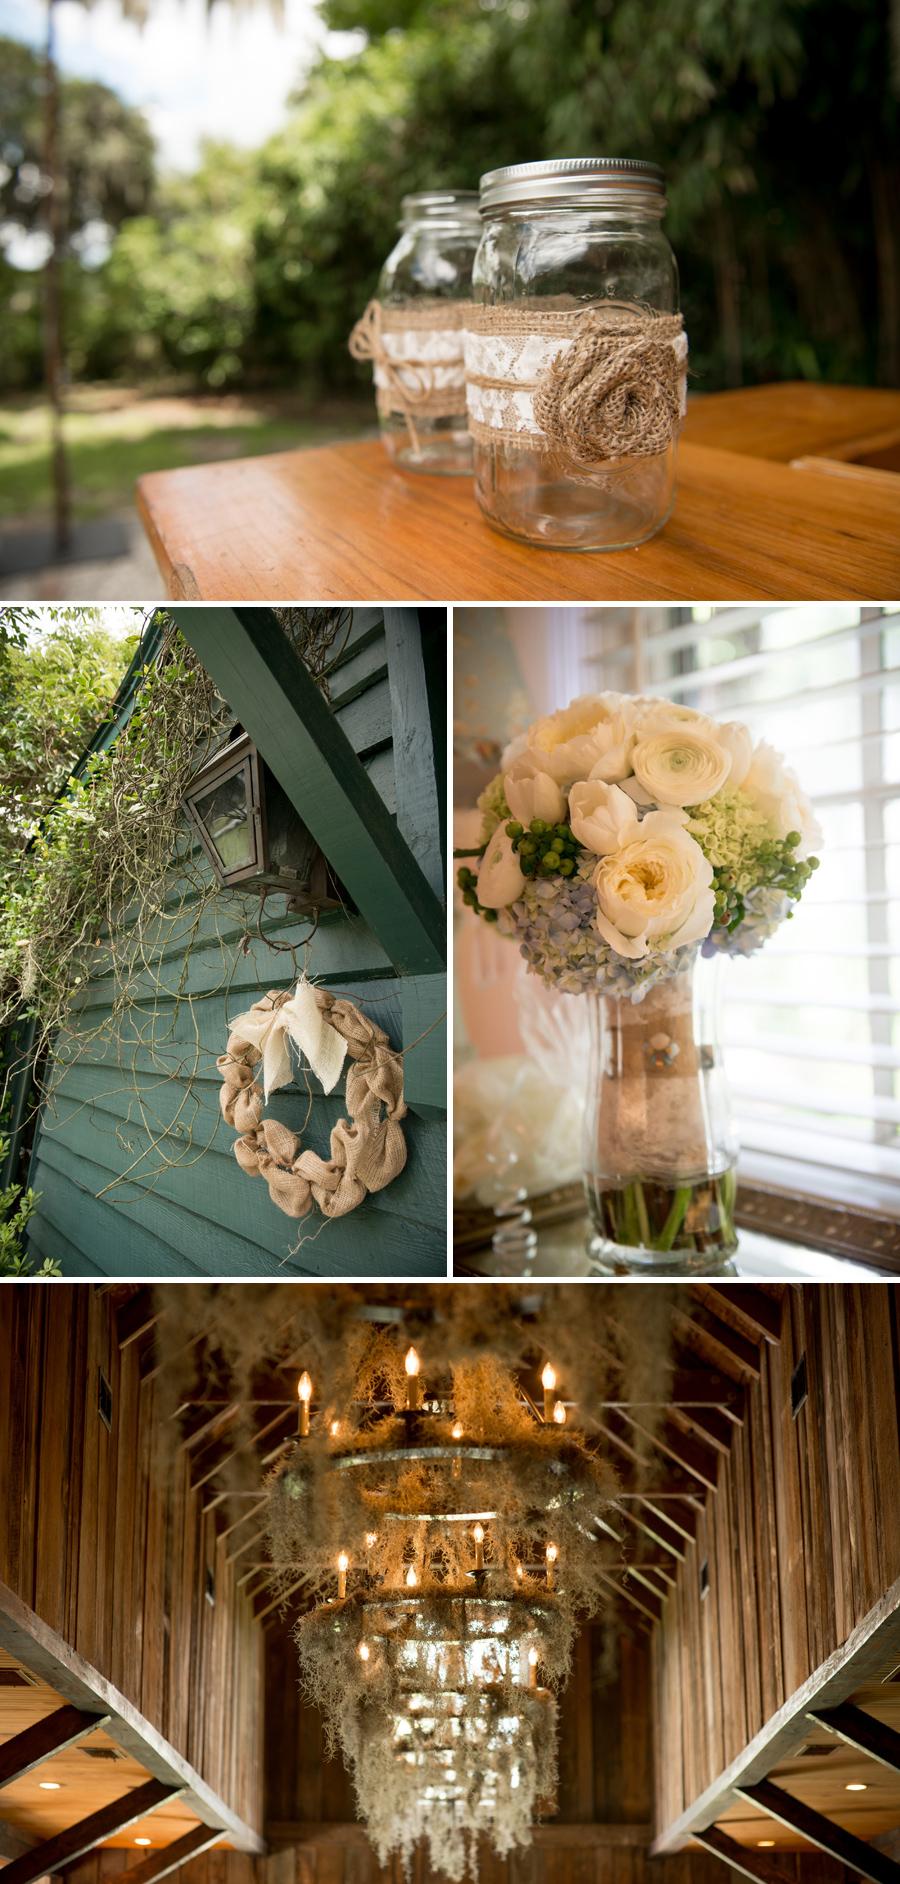 ALIX + DAVID - wedding at Magnolia Plantation and Gardens ...